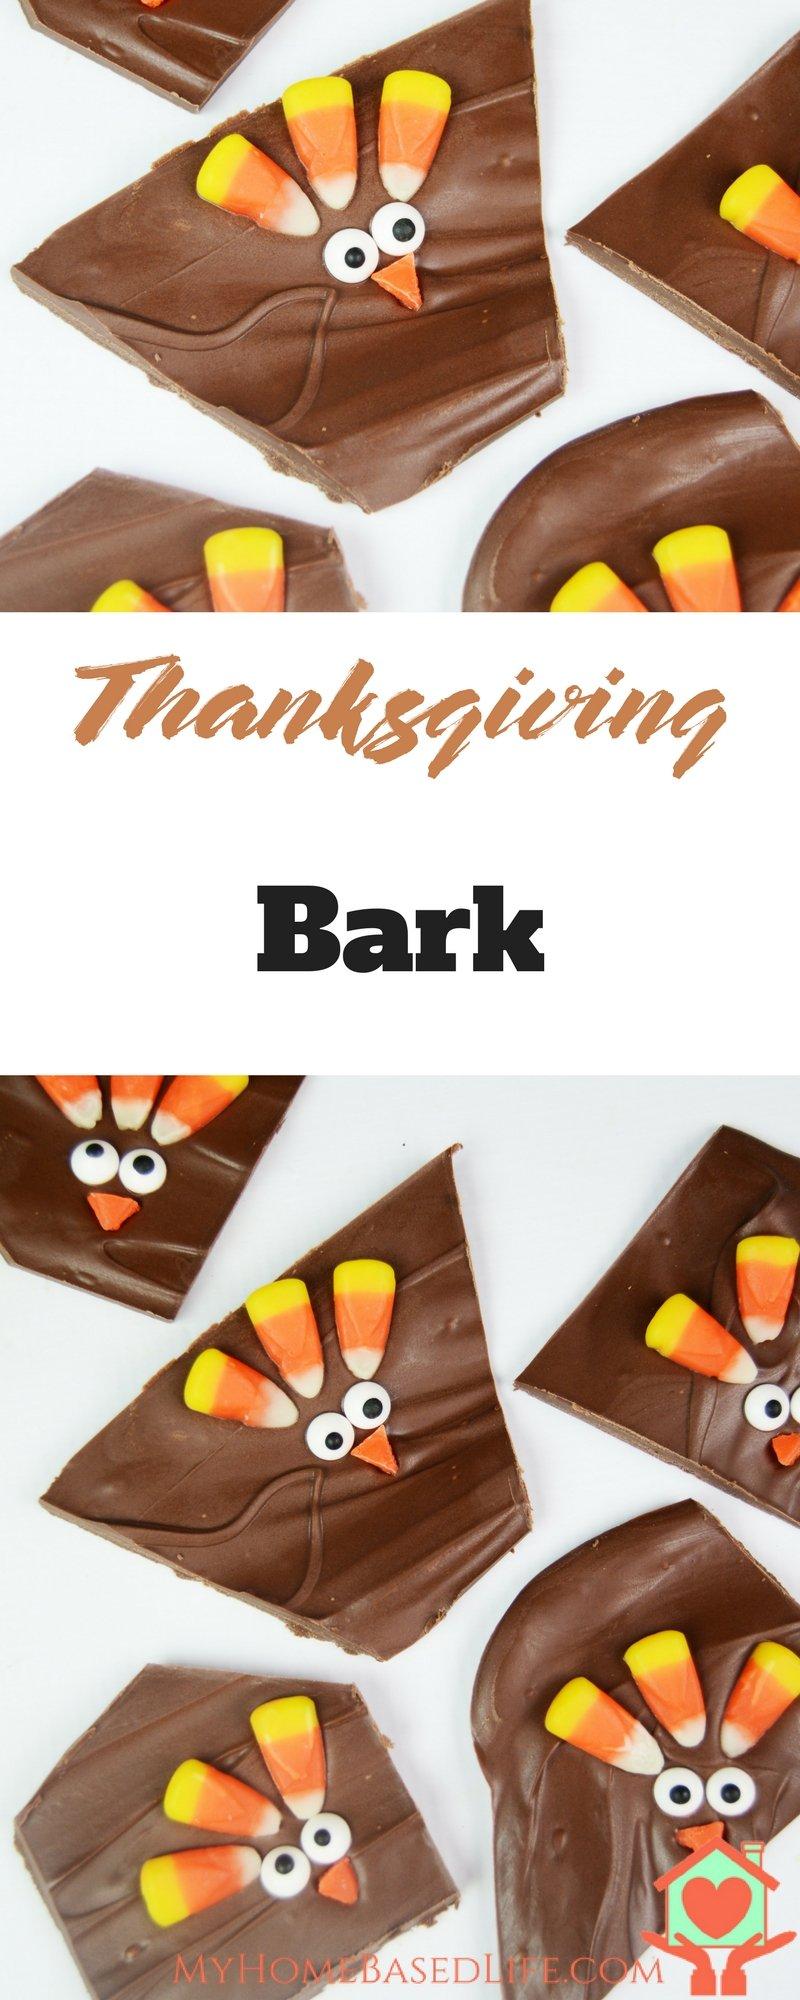 Thanksgiving Bark | Turkey Dessert | Thanksgiving Dessert | Thanksgiving Treat | Kid's Thanksgiving | Fall Themed Dessert | Turkey Treat | DIY Turkey |